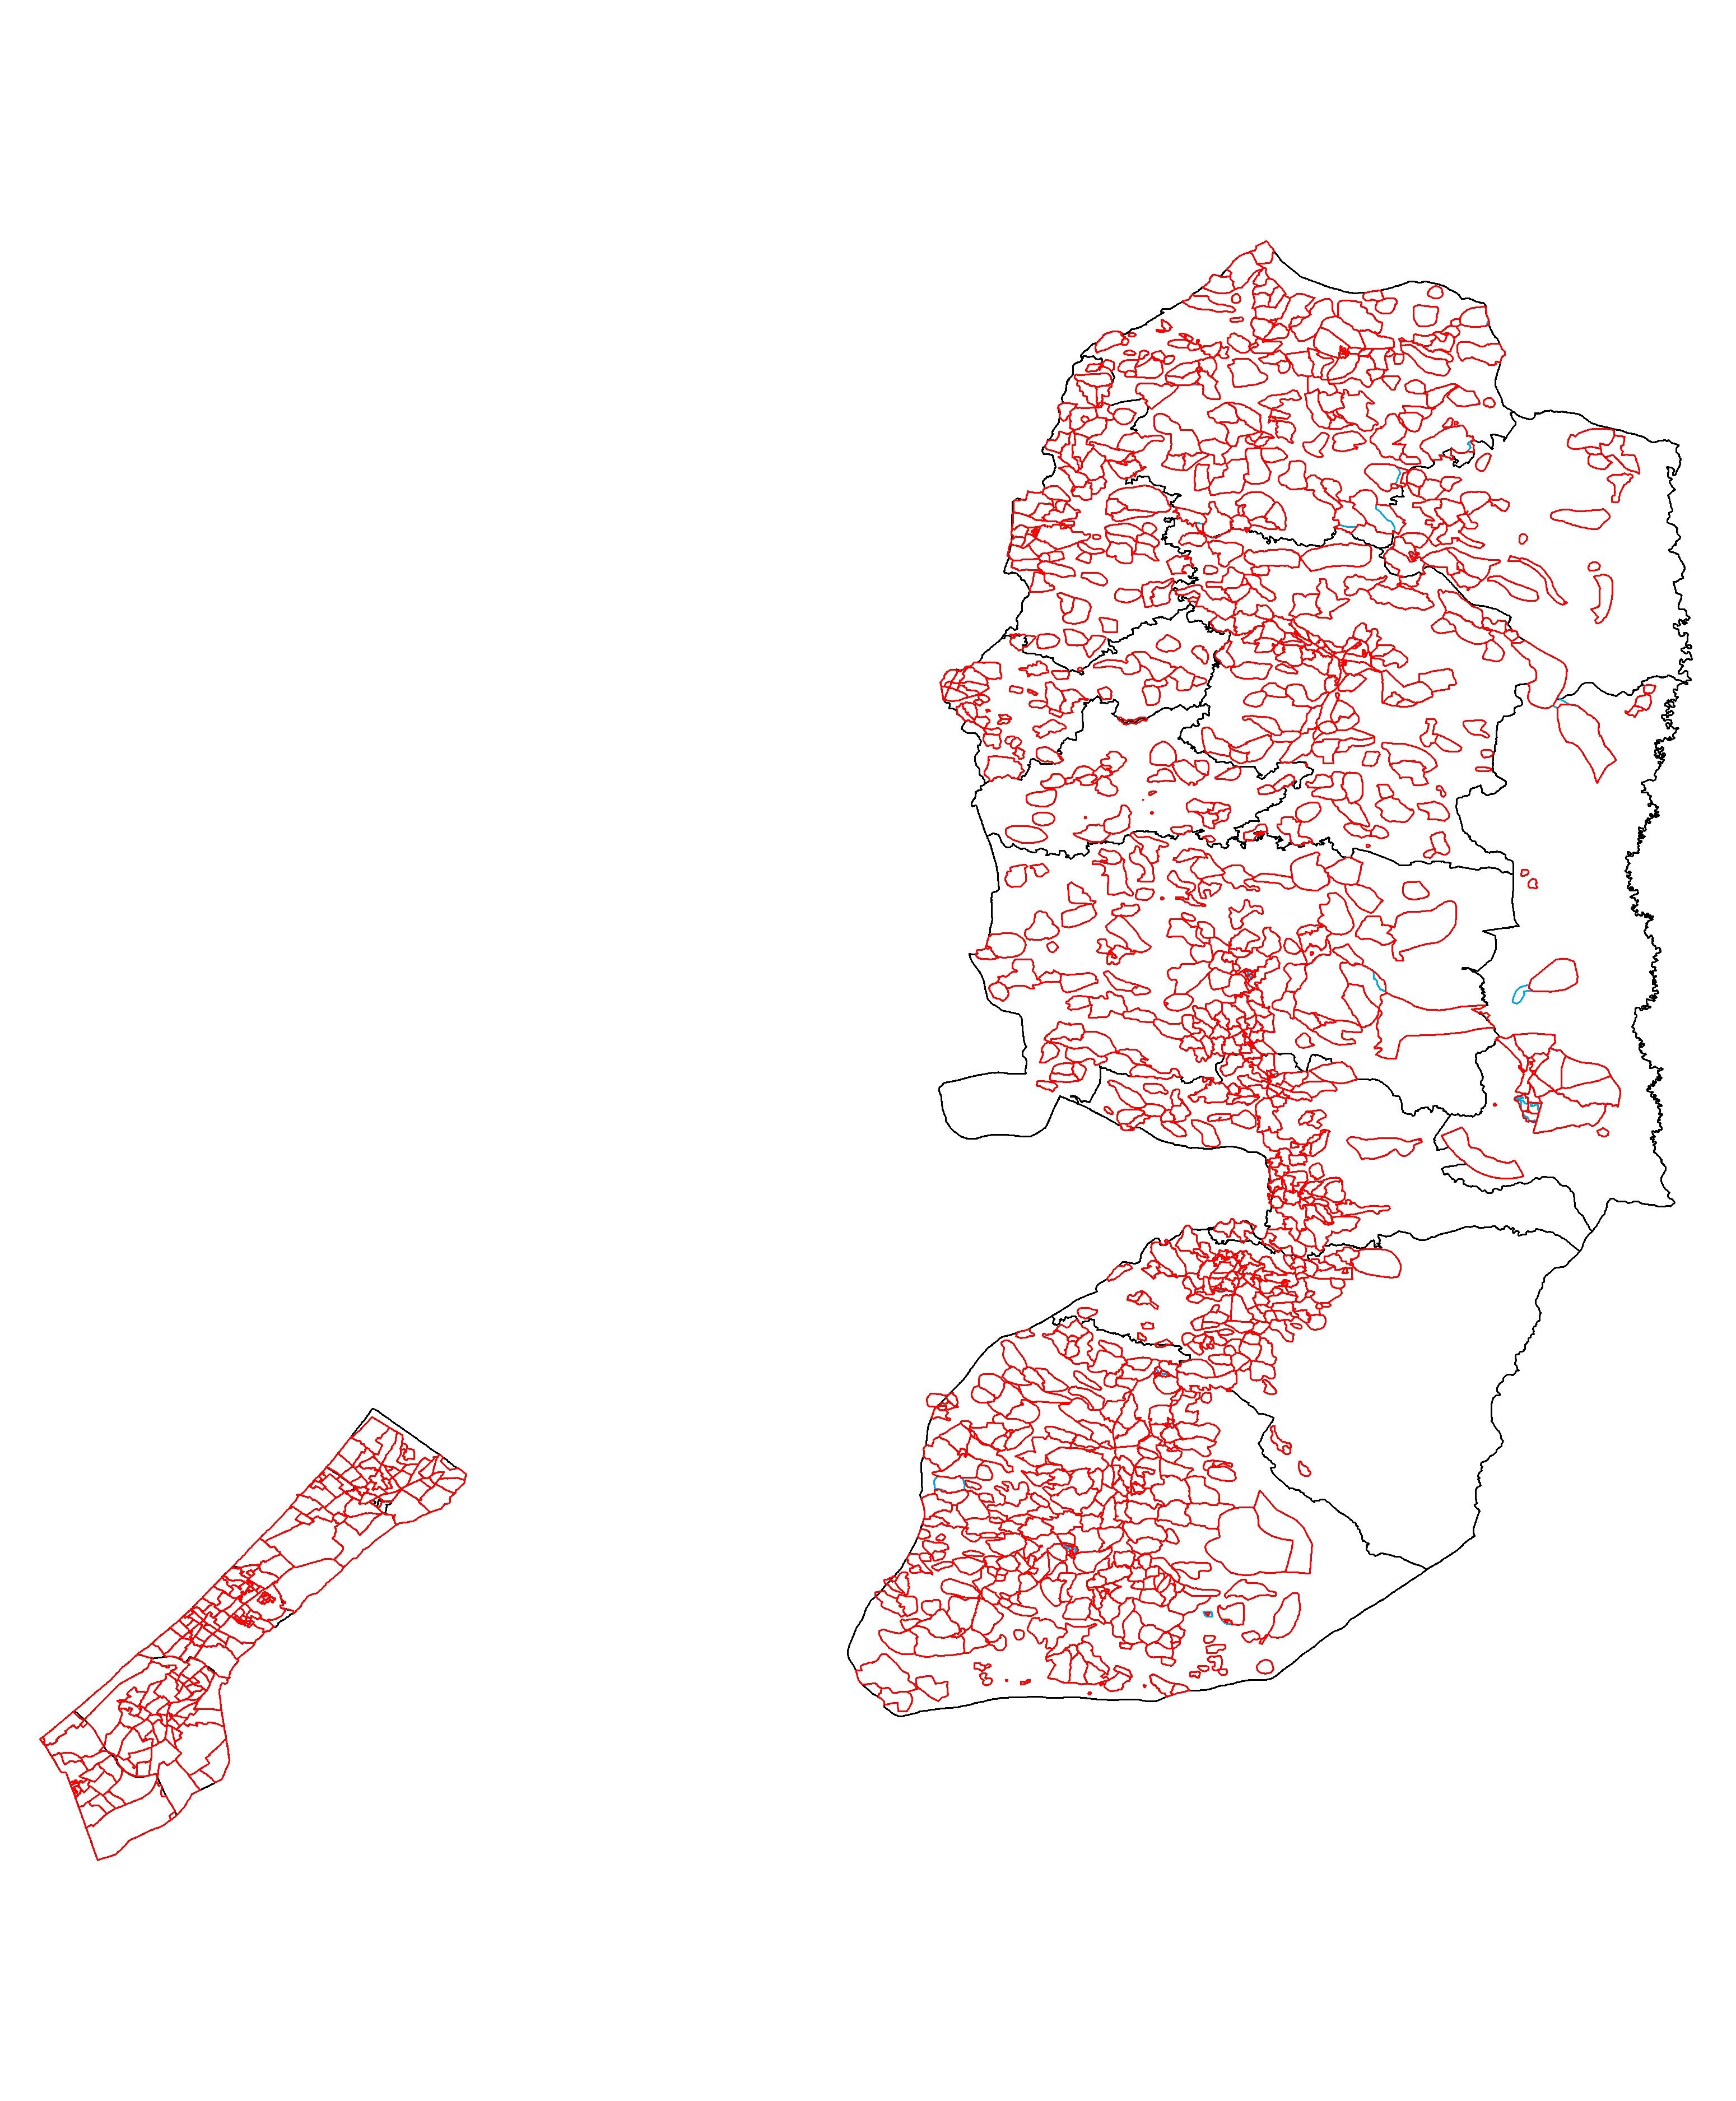 Palestine Census Shapefile Data!! – Revolutionary GIS